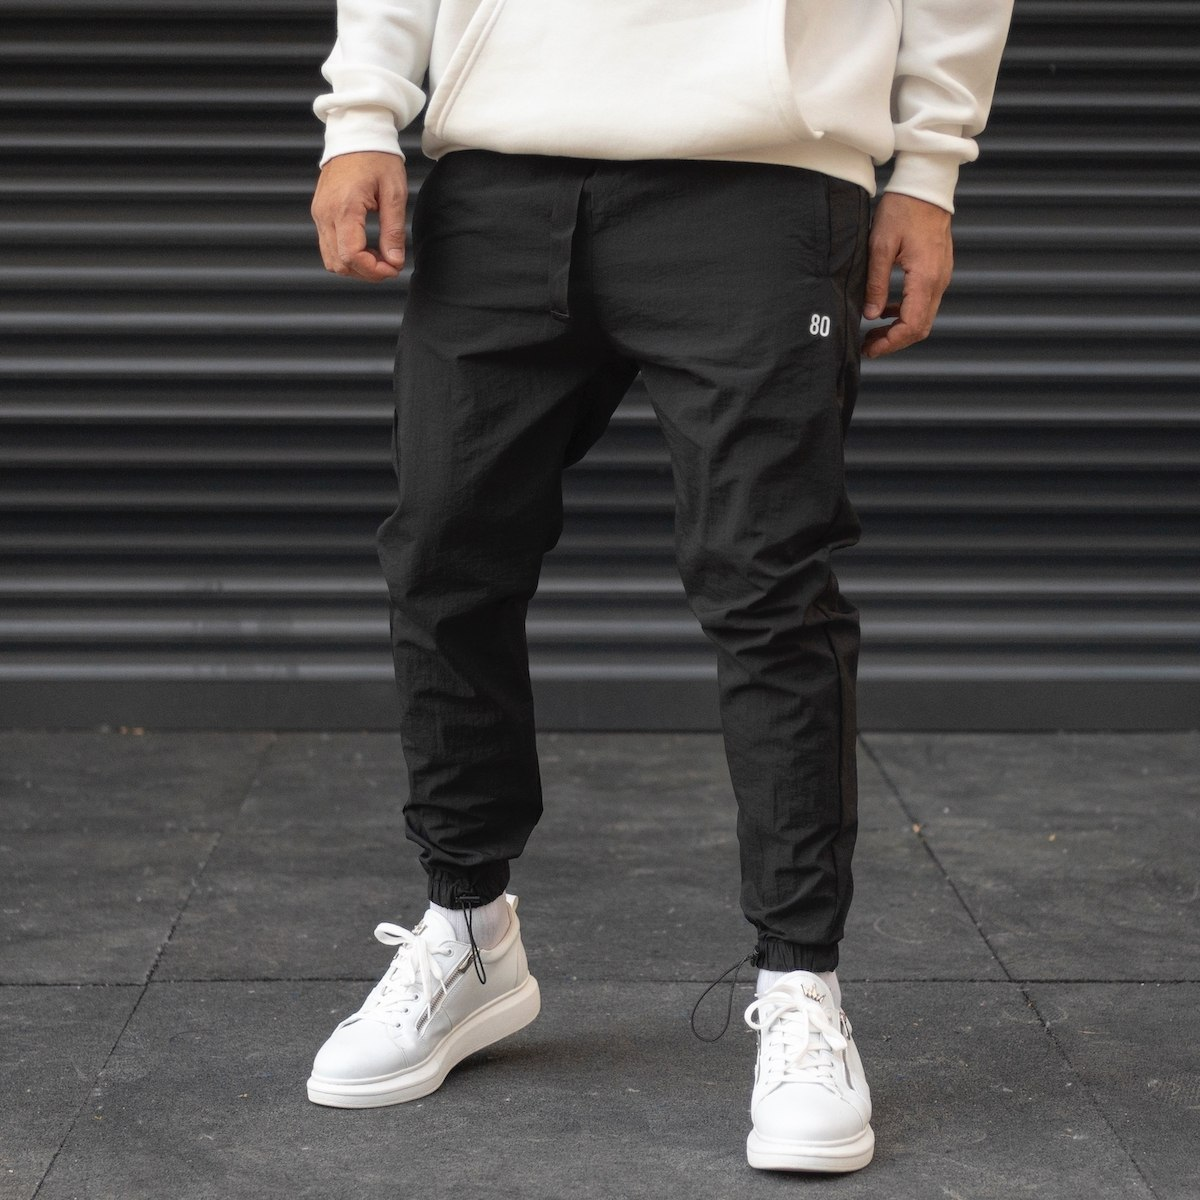 Men's Parachute Fabric Sweatpants With Elastic Hem In Black